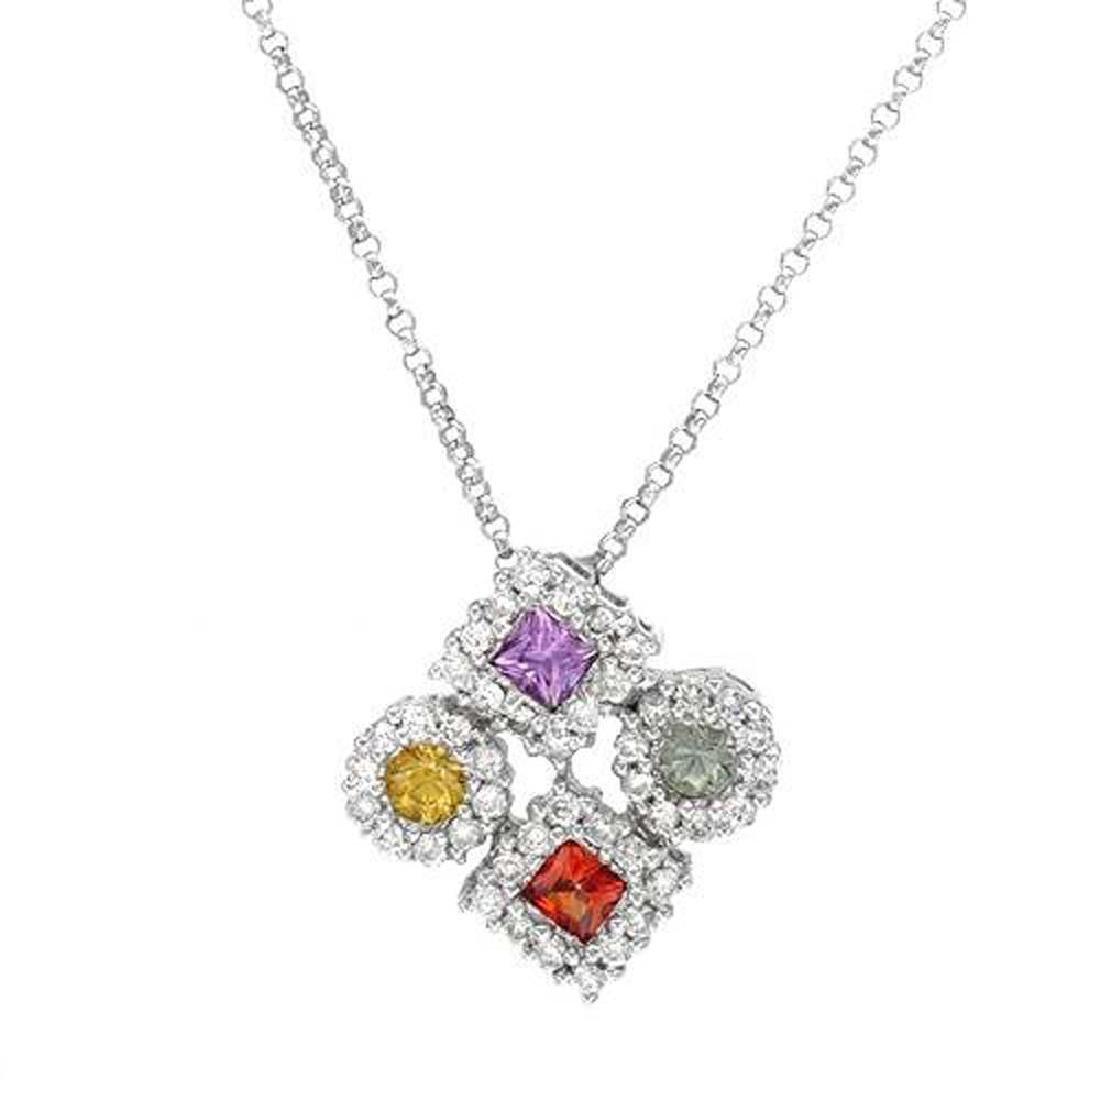 Genuine 1.14 TCW 14K White Gold Ladies Necklace